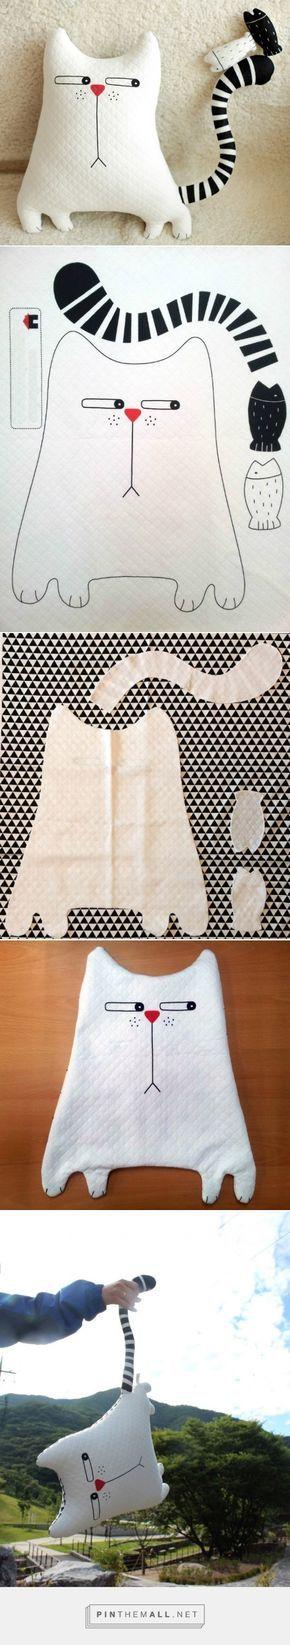 Stuffed Cat Pillow Tutorial. Кот-подушка ~ HandMadiya.com... - a grouped images picture - Pin Them All